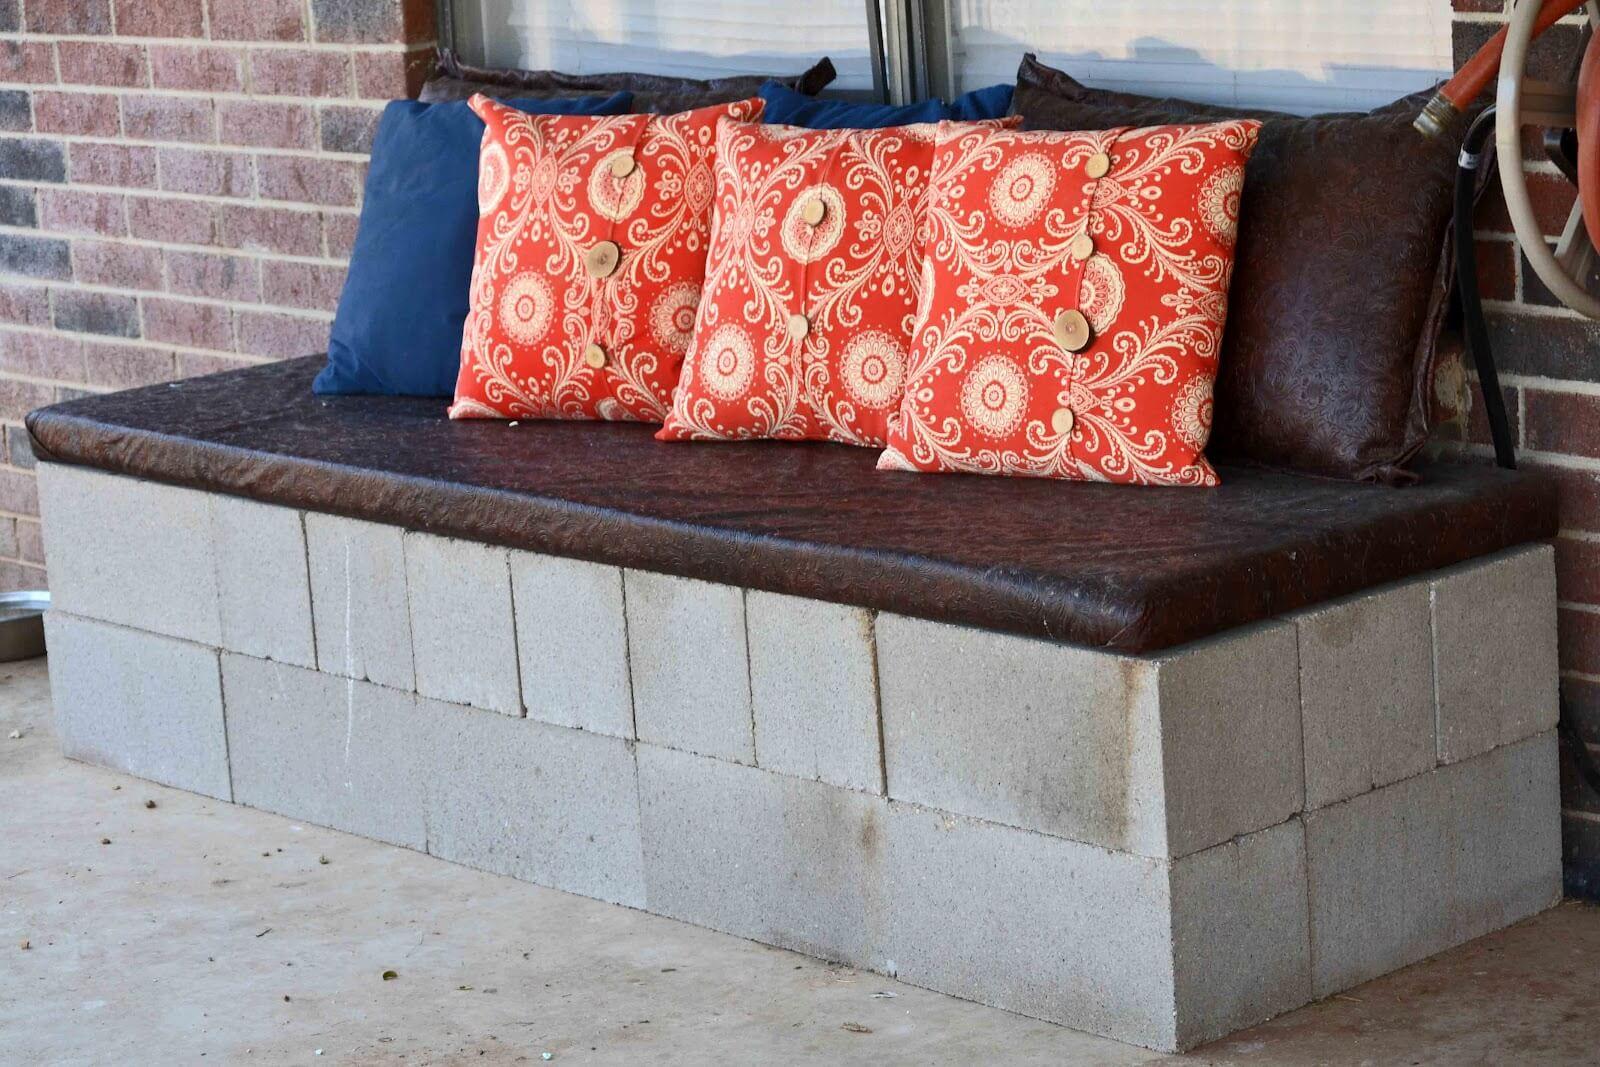 Outdoor Cinder Block 'Sofa'